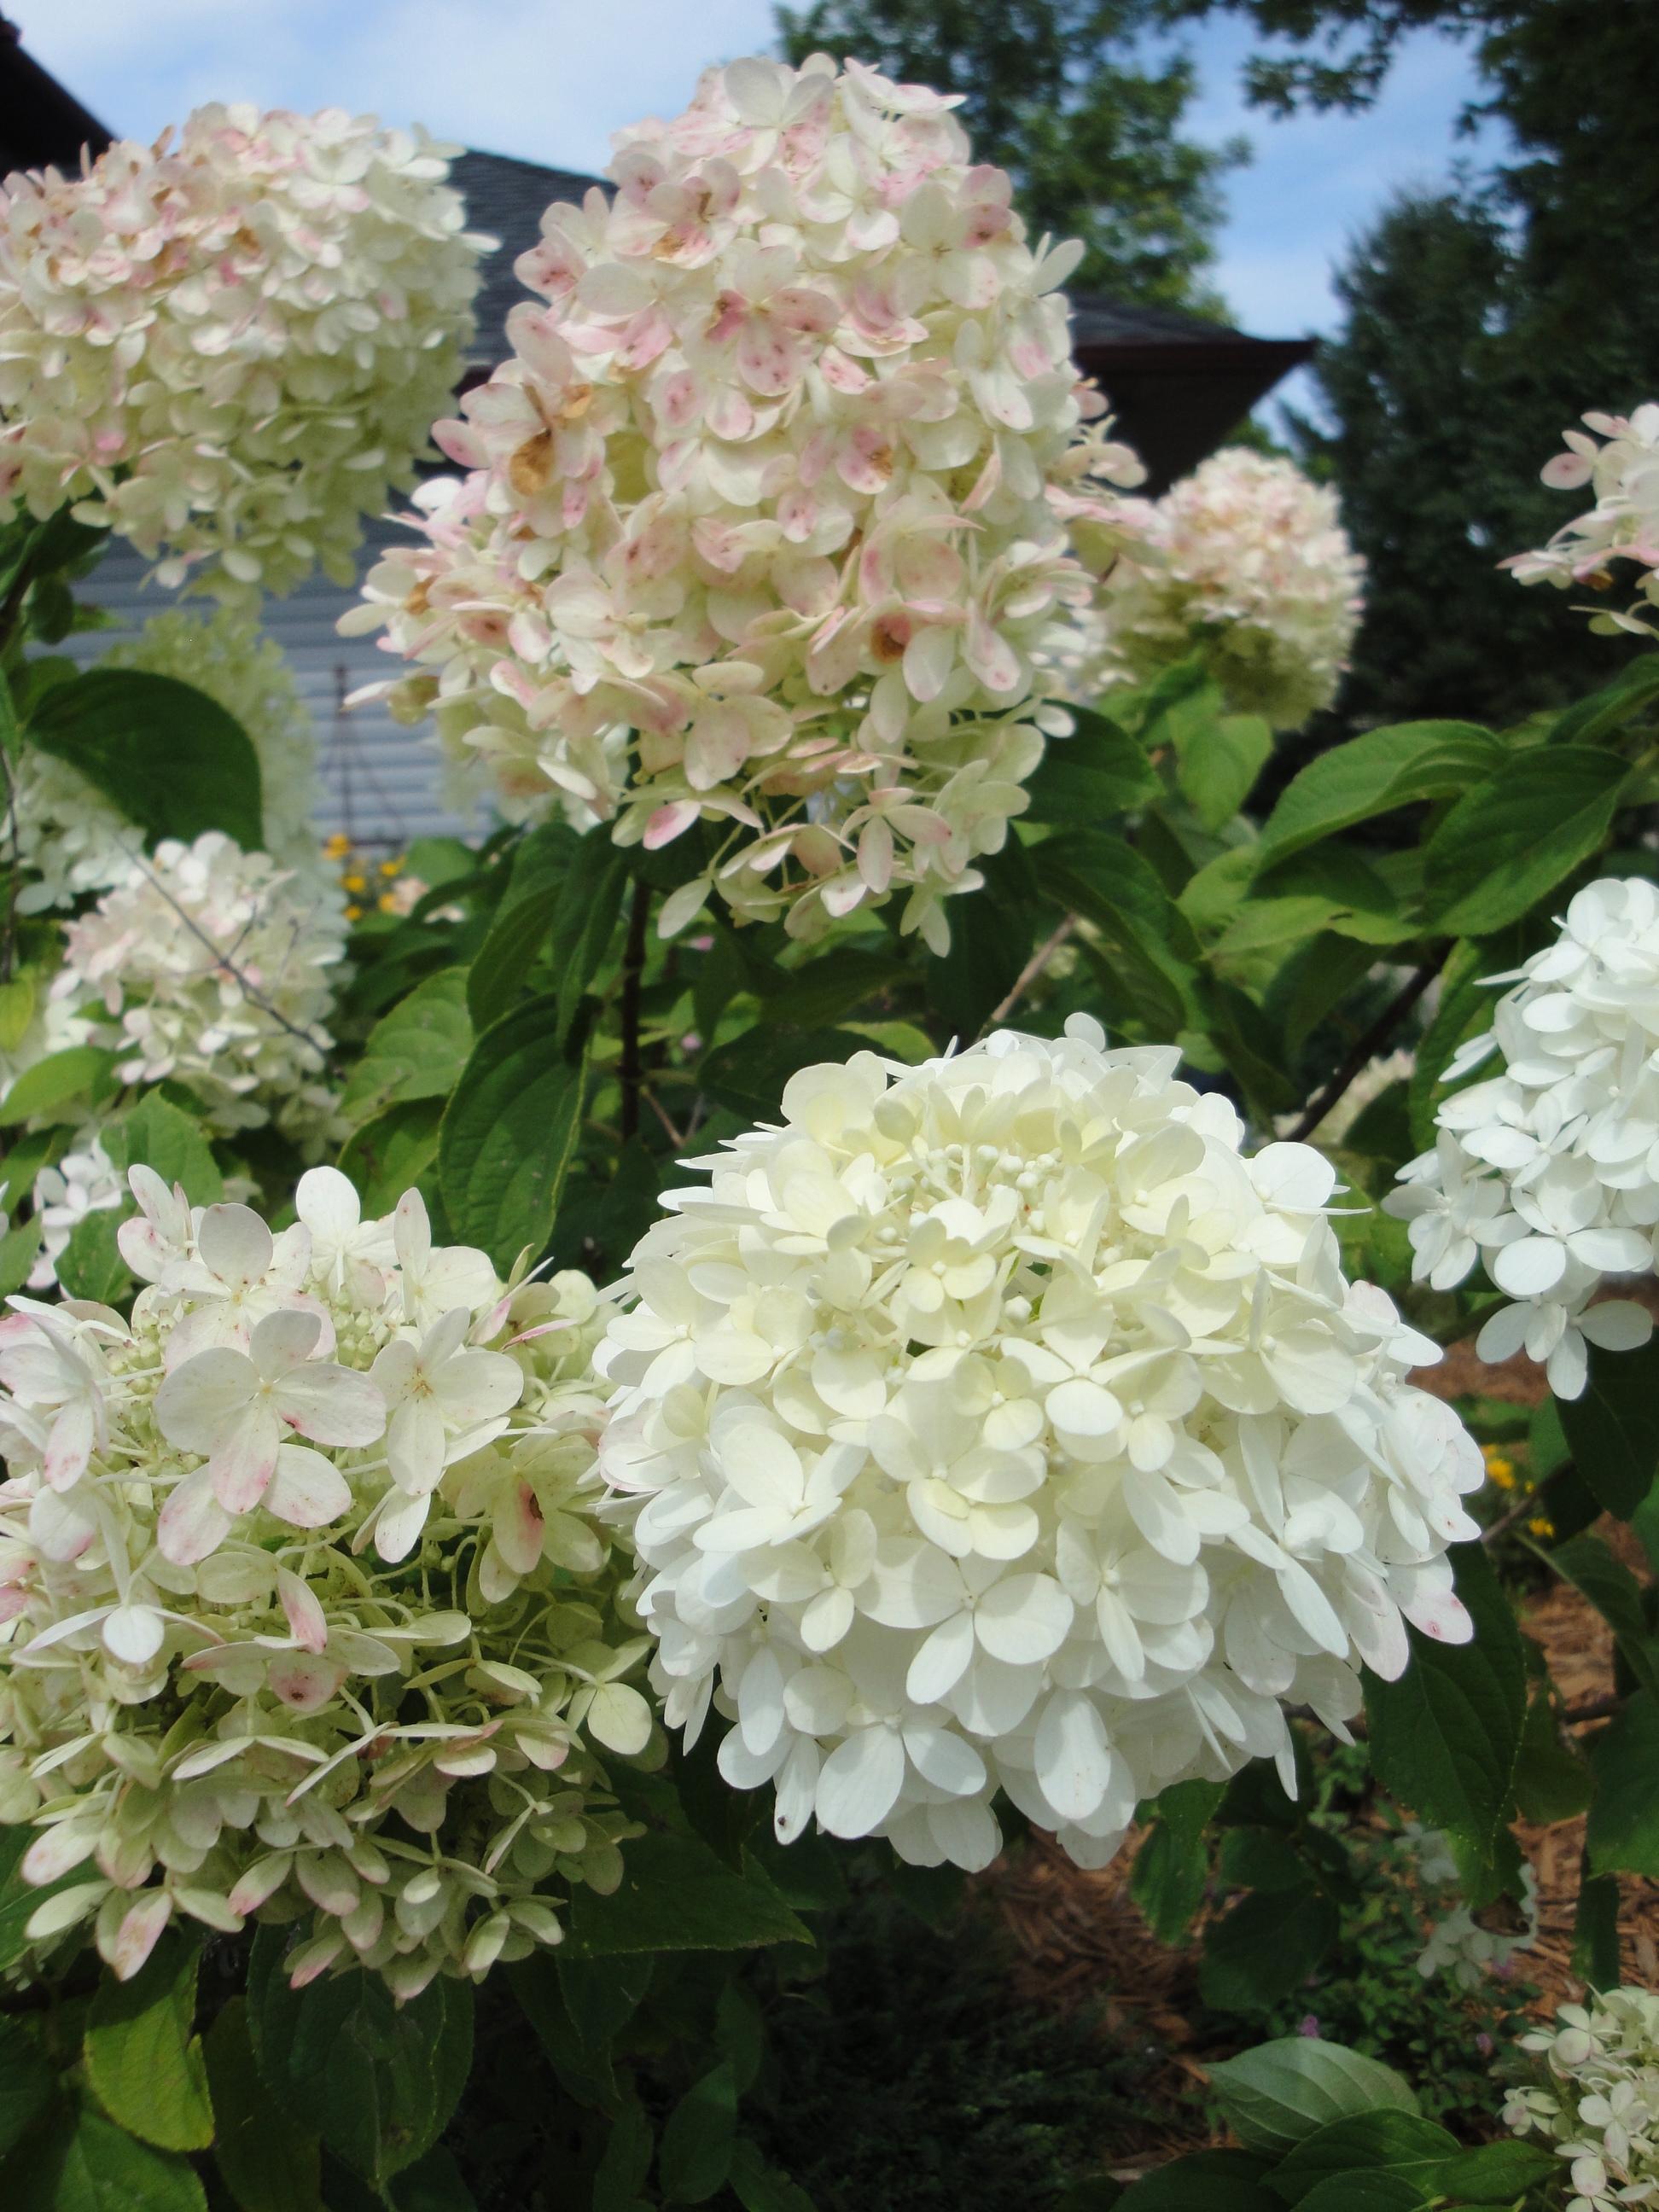 Limelight hydrangea bloom